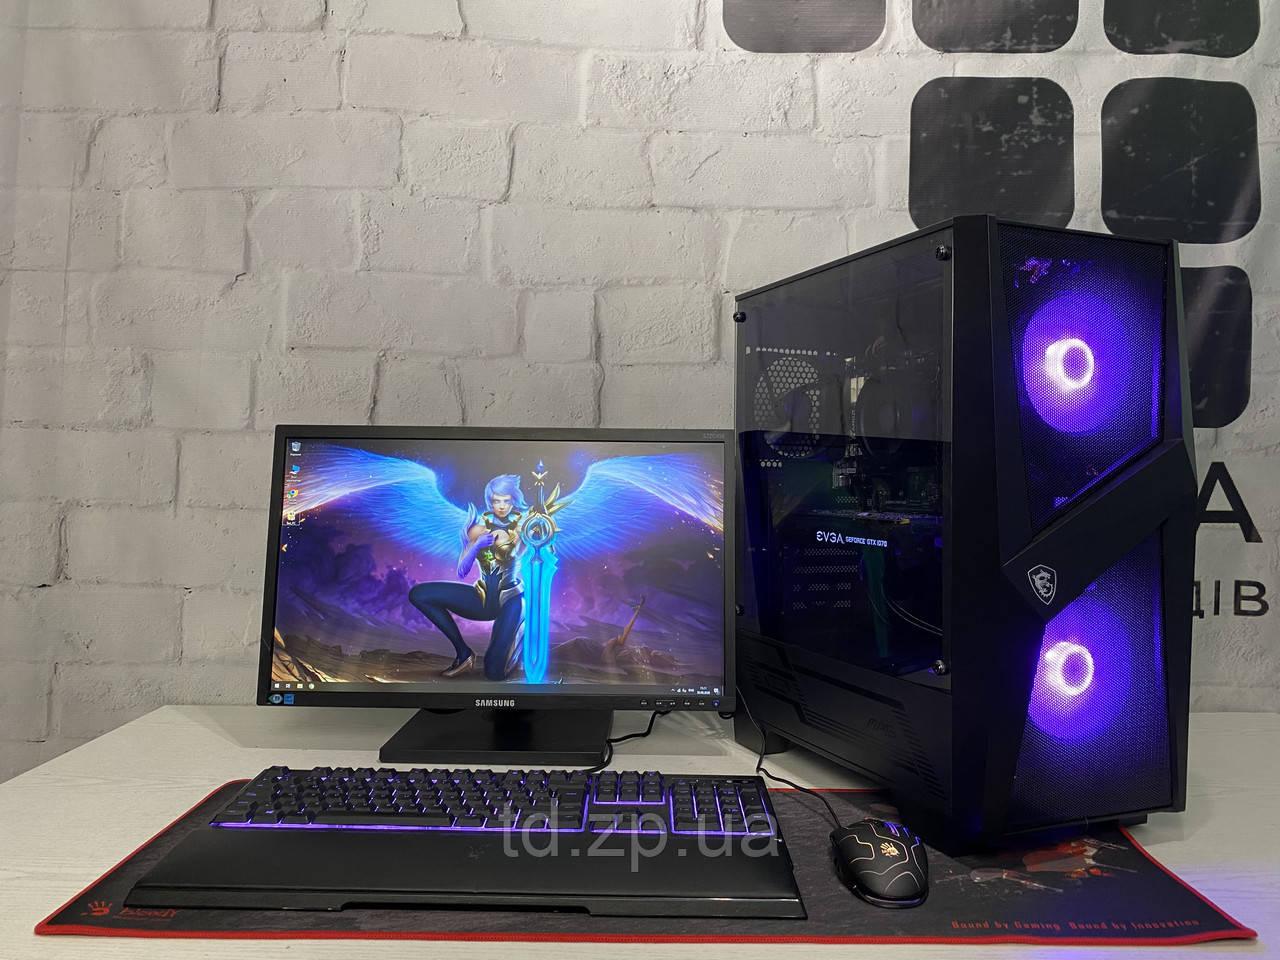 Игровой компьютер Ryzen 5 2600 + NVIDIA GTX 1060 6Gb + RAM 16gb + HDD 1000Gb + SSD 240